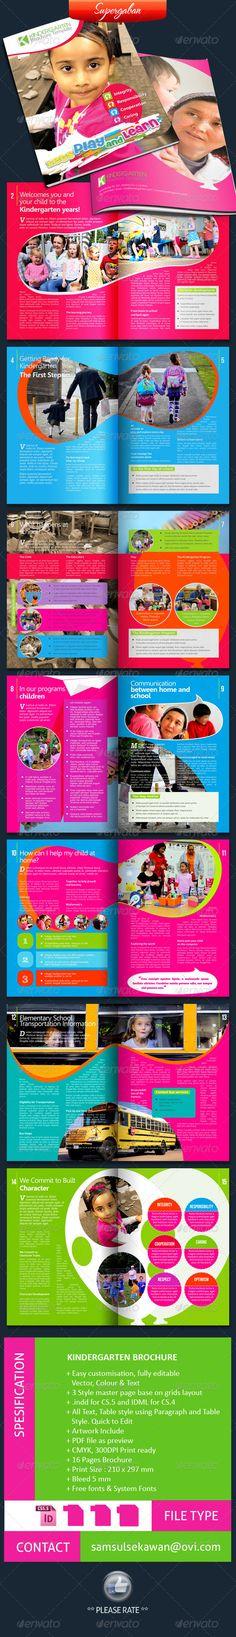 CL (cl3018) on Pinterest - kindergarten brochure template